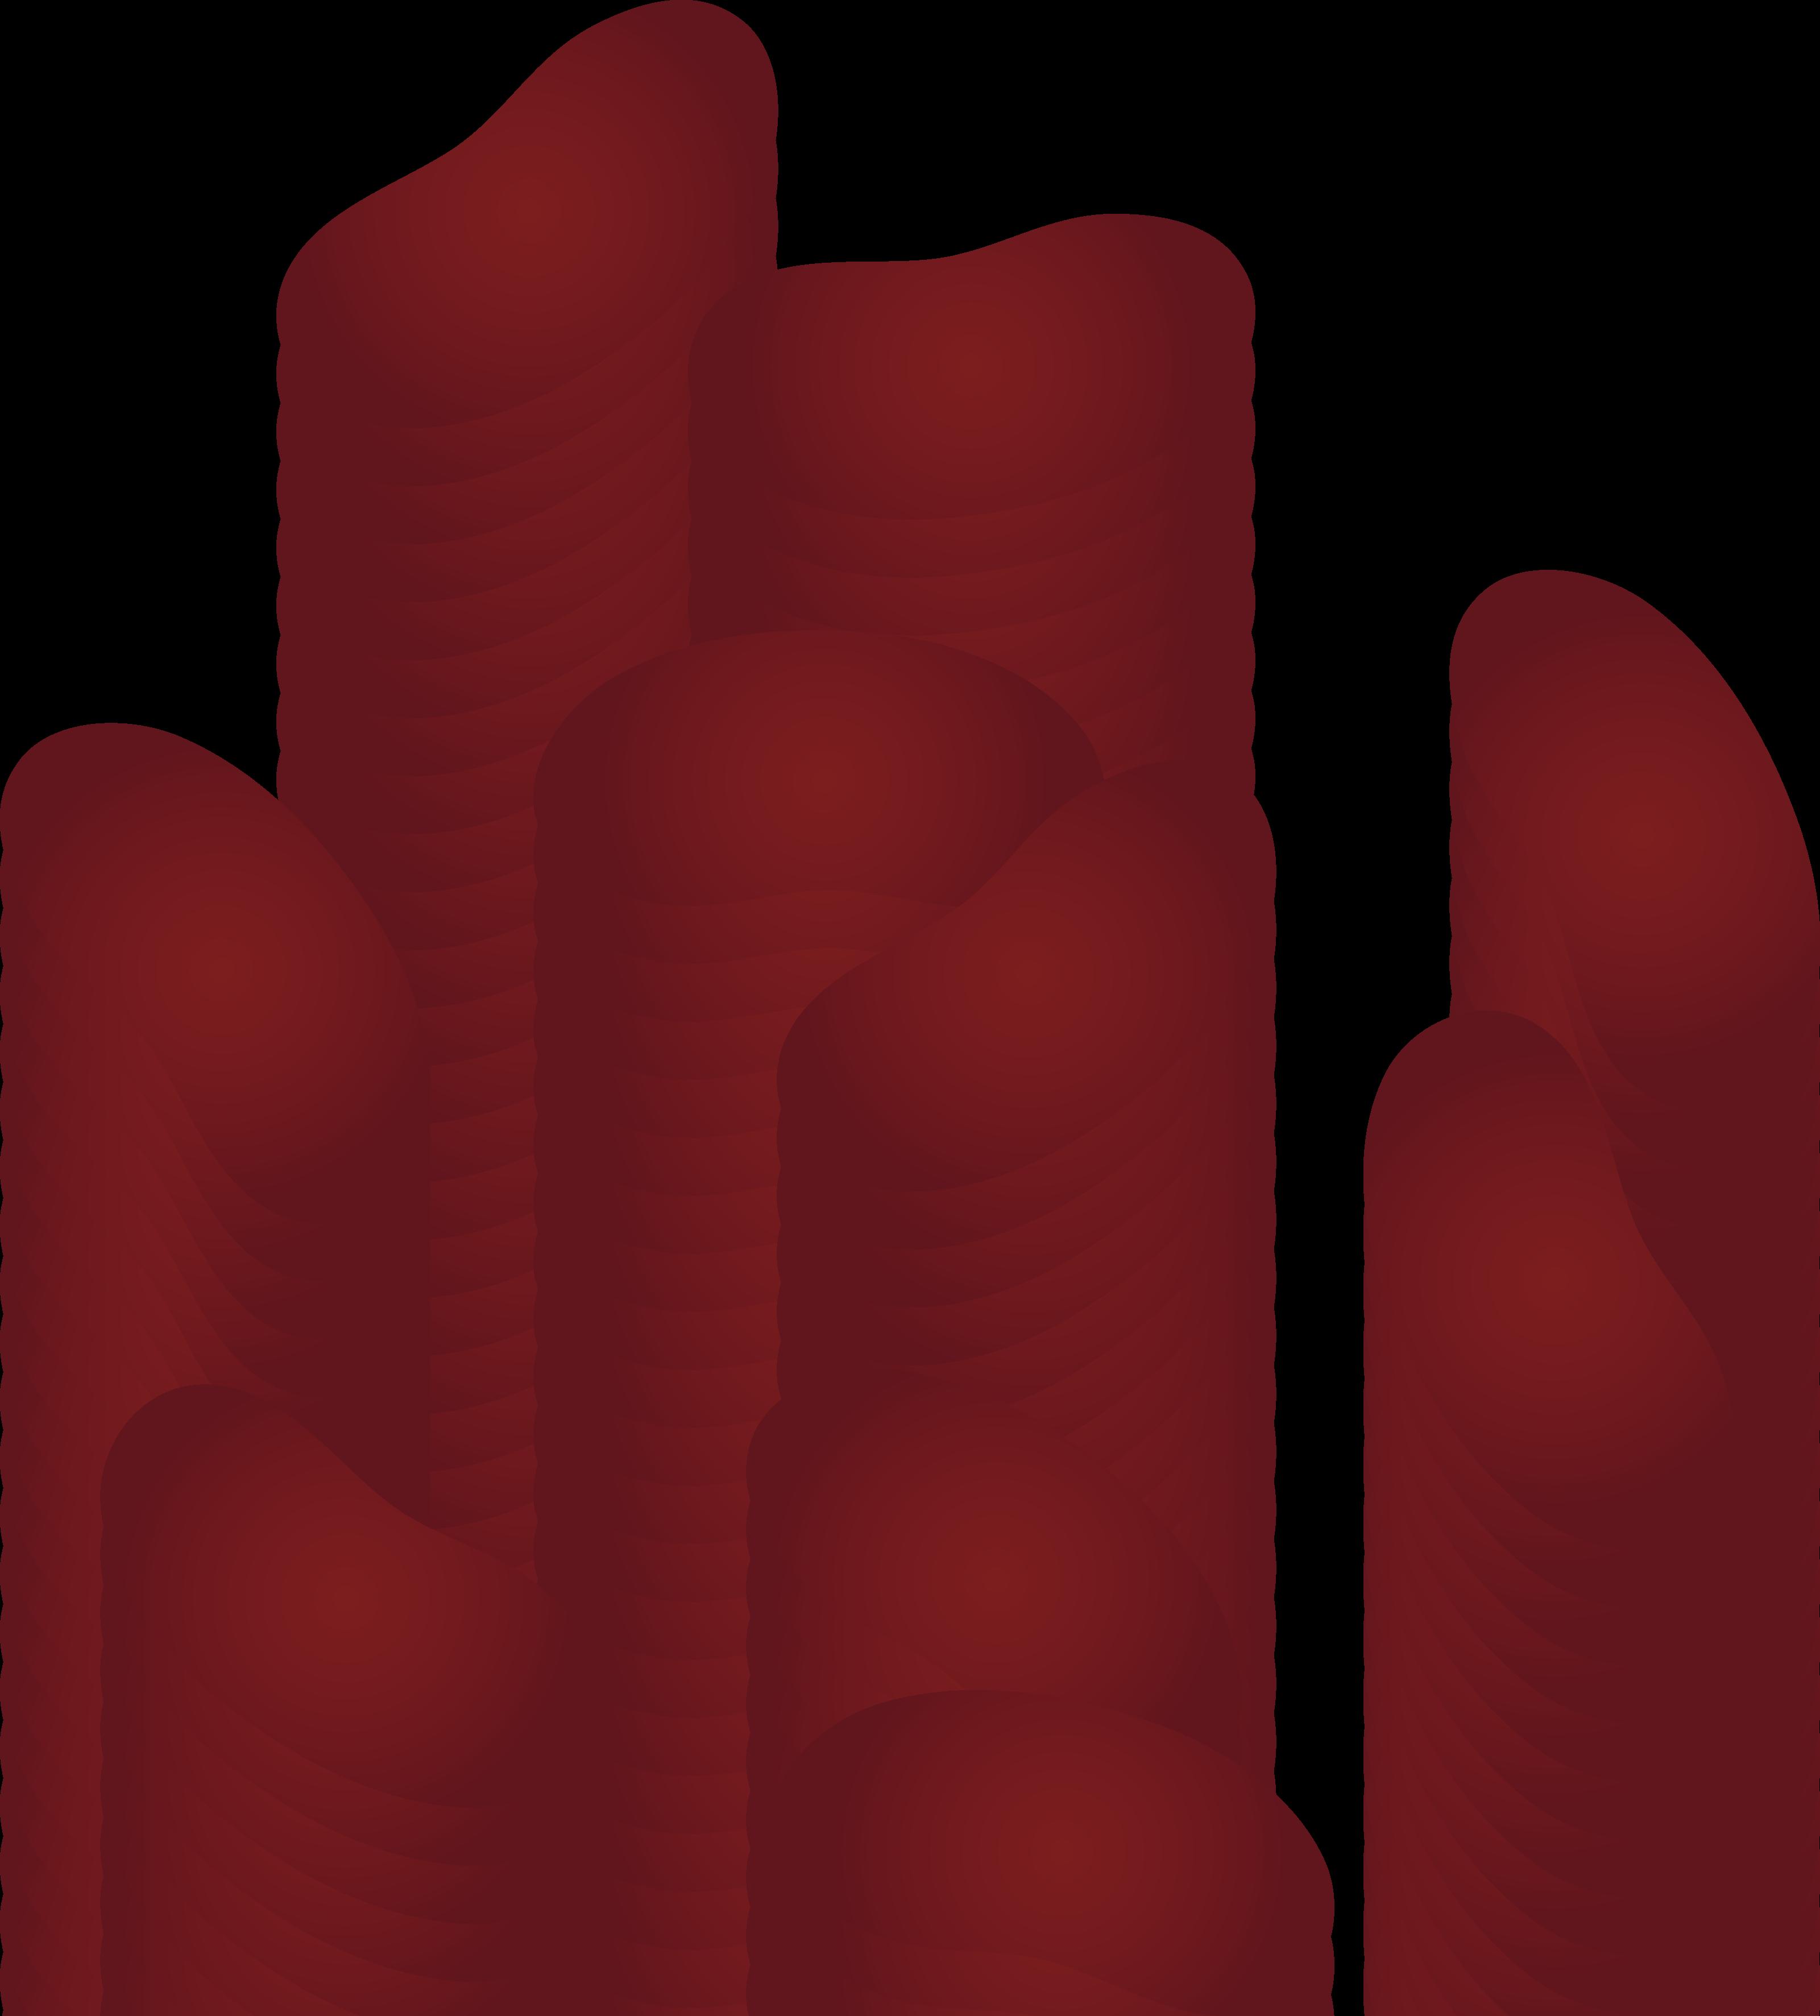 3201x3545 Scattered Kidney Beans